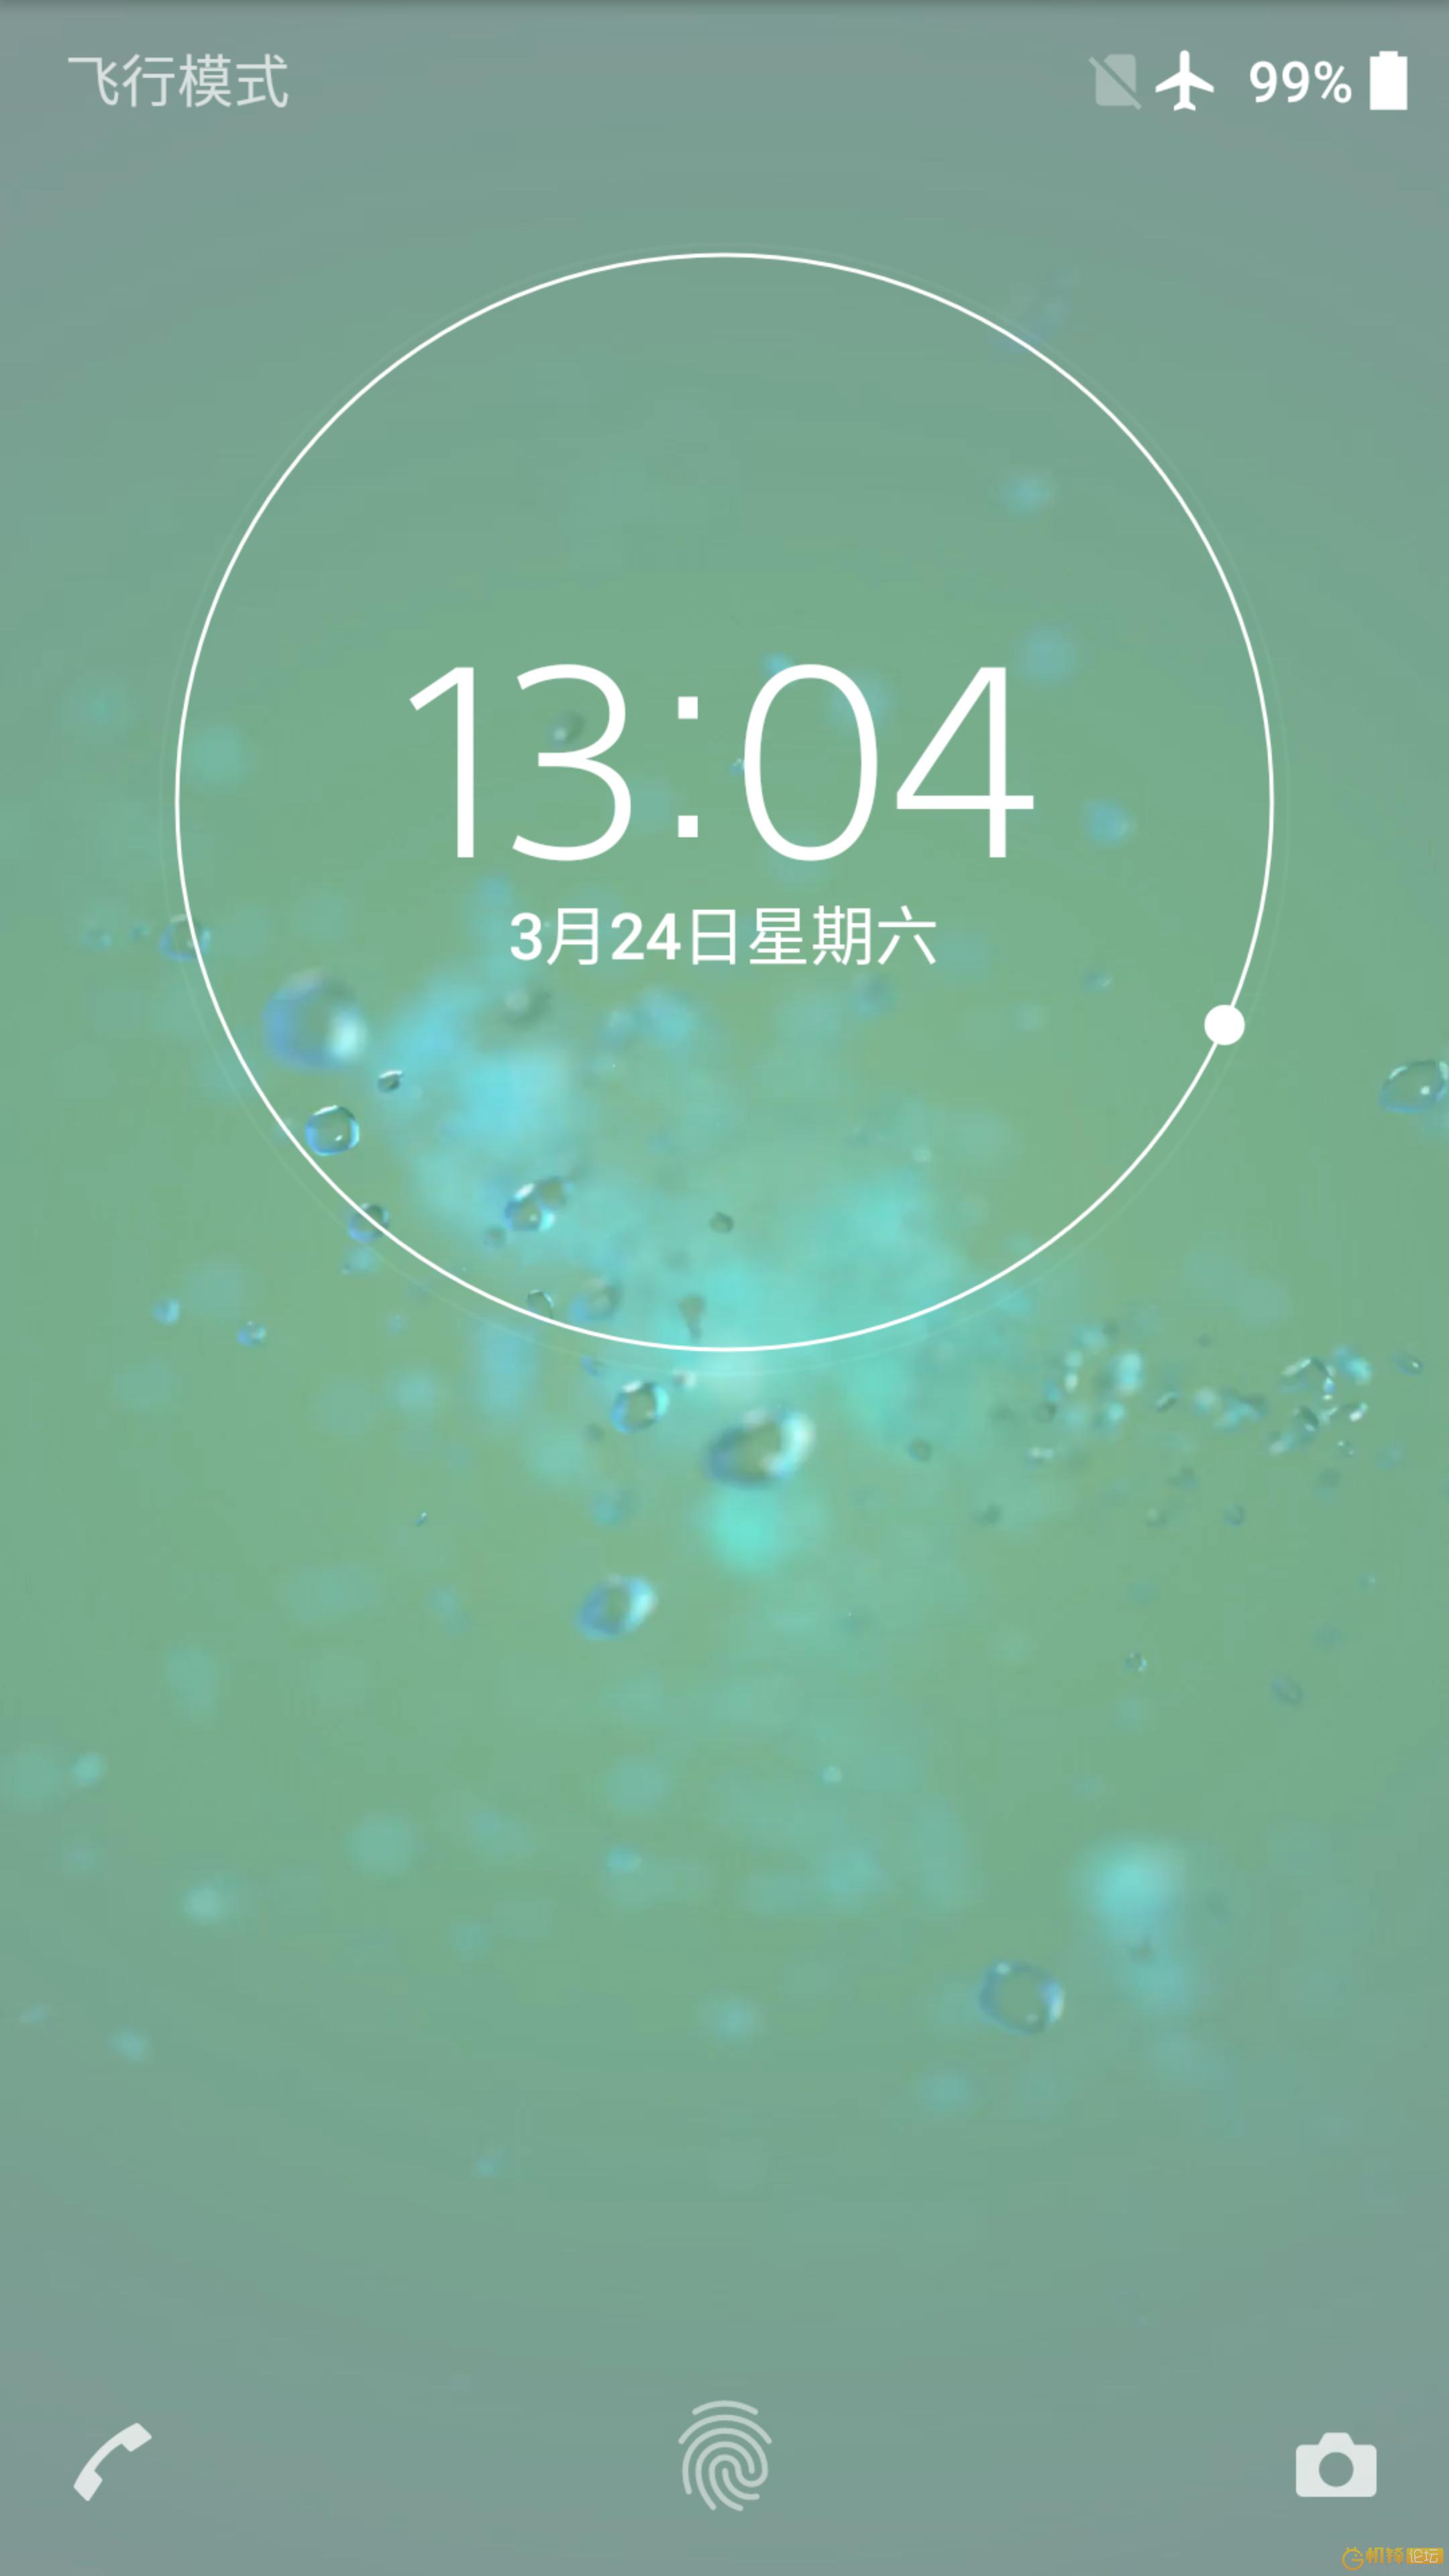 Screenshot_20180324-130421.png